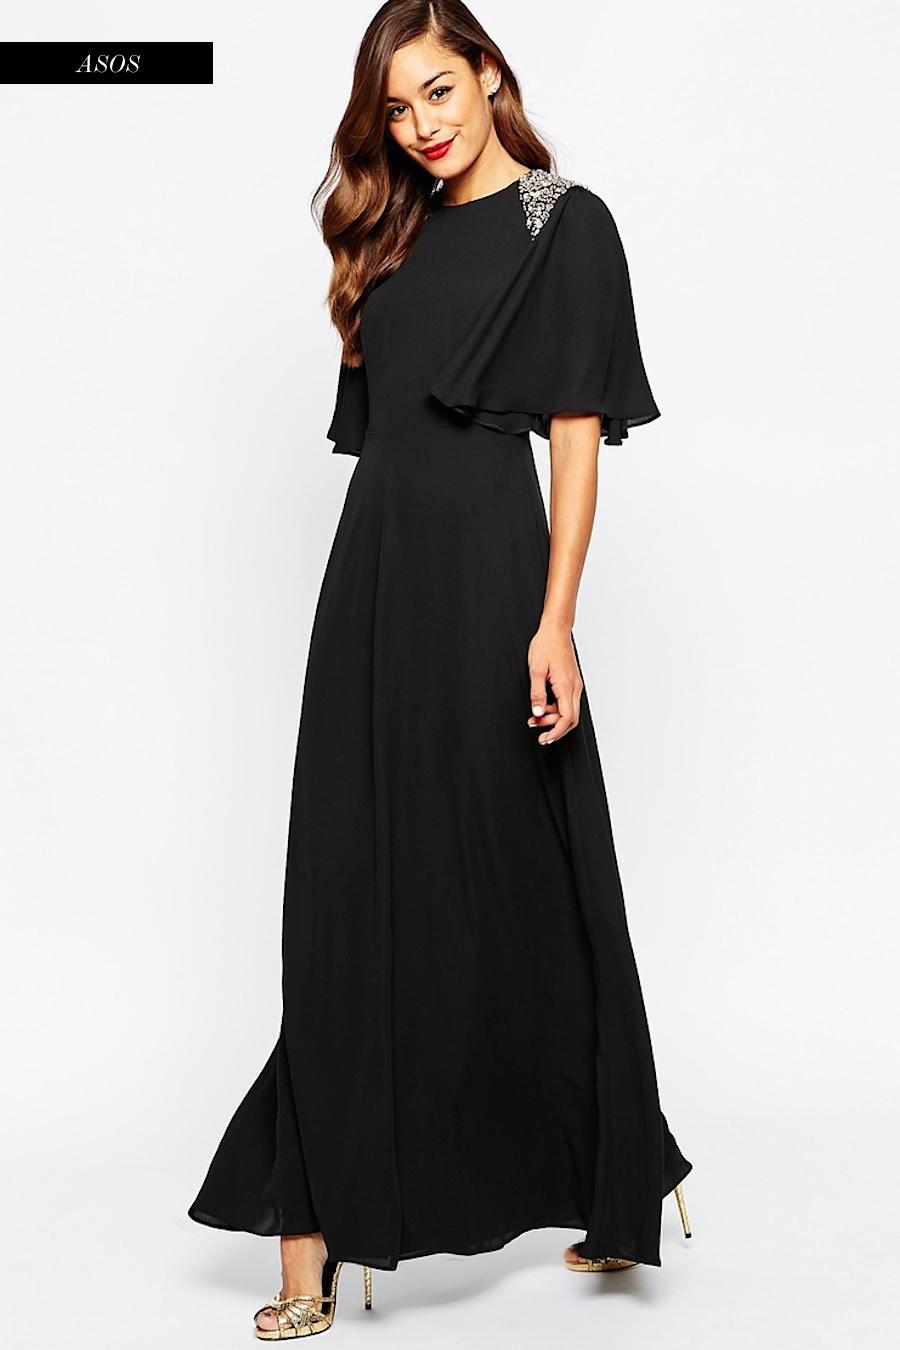 Maxi dress under 200 fash-n-chips.com 6